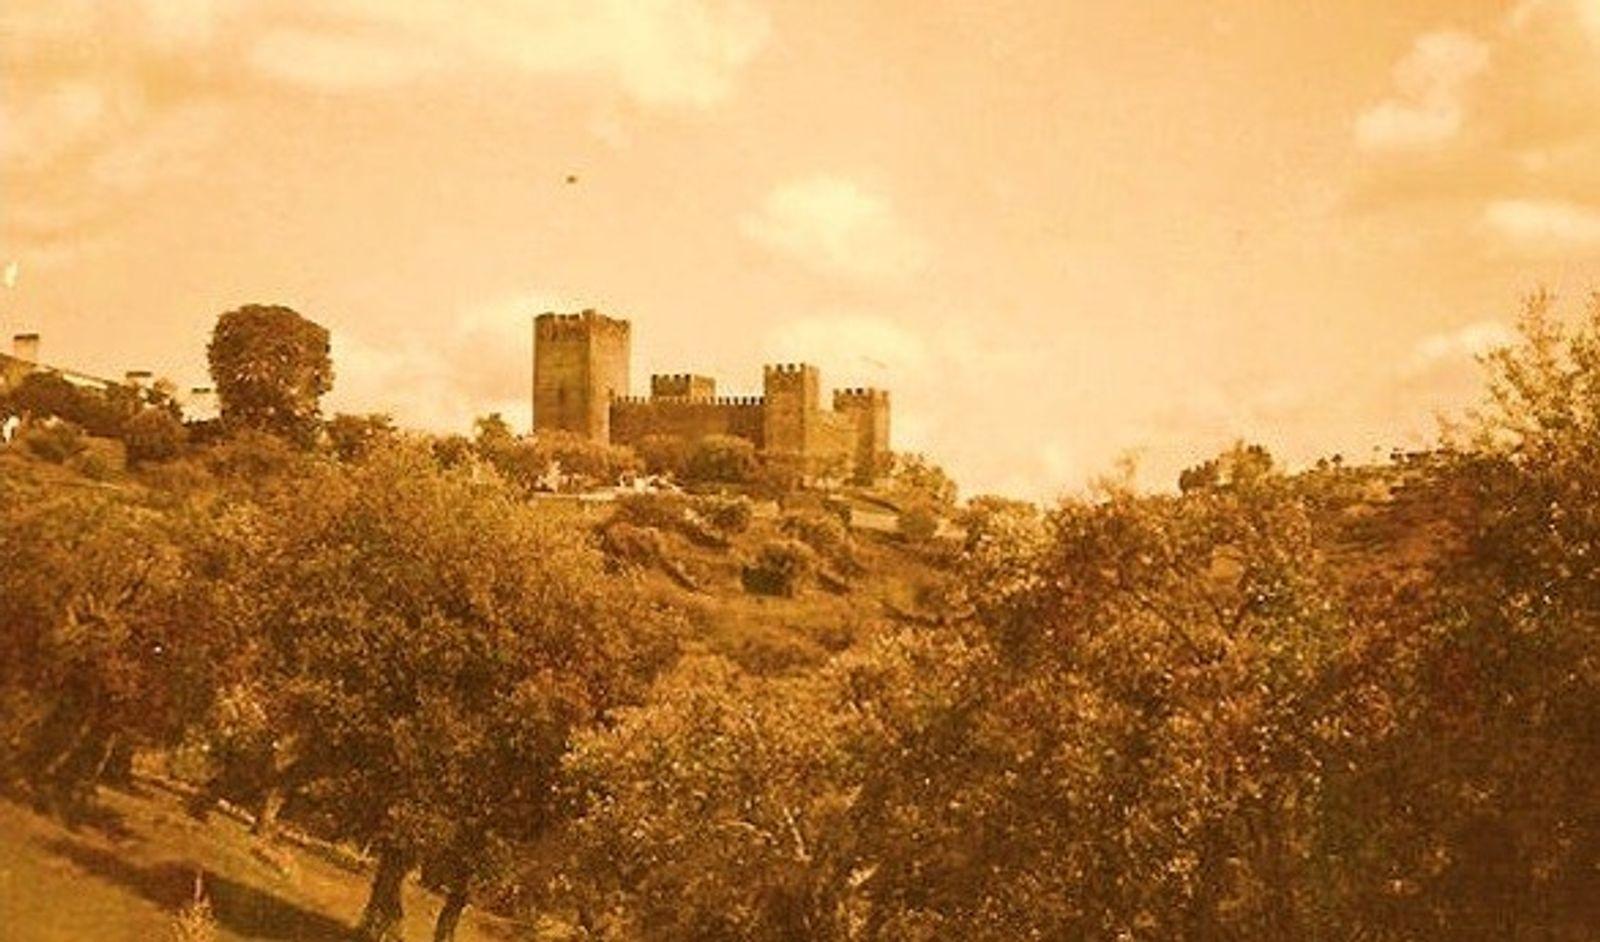 Descubra os 12 Incríveis Castelos no Alentejo